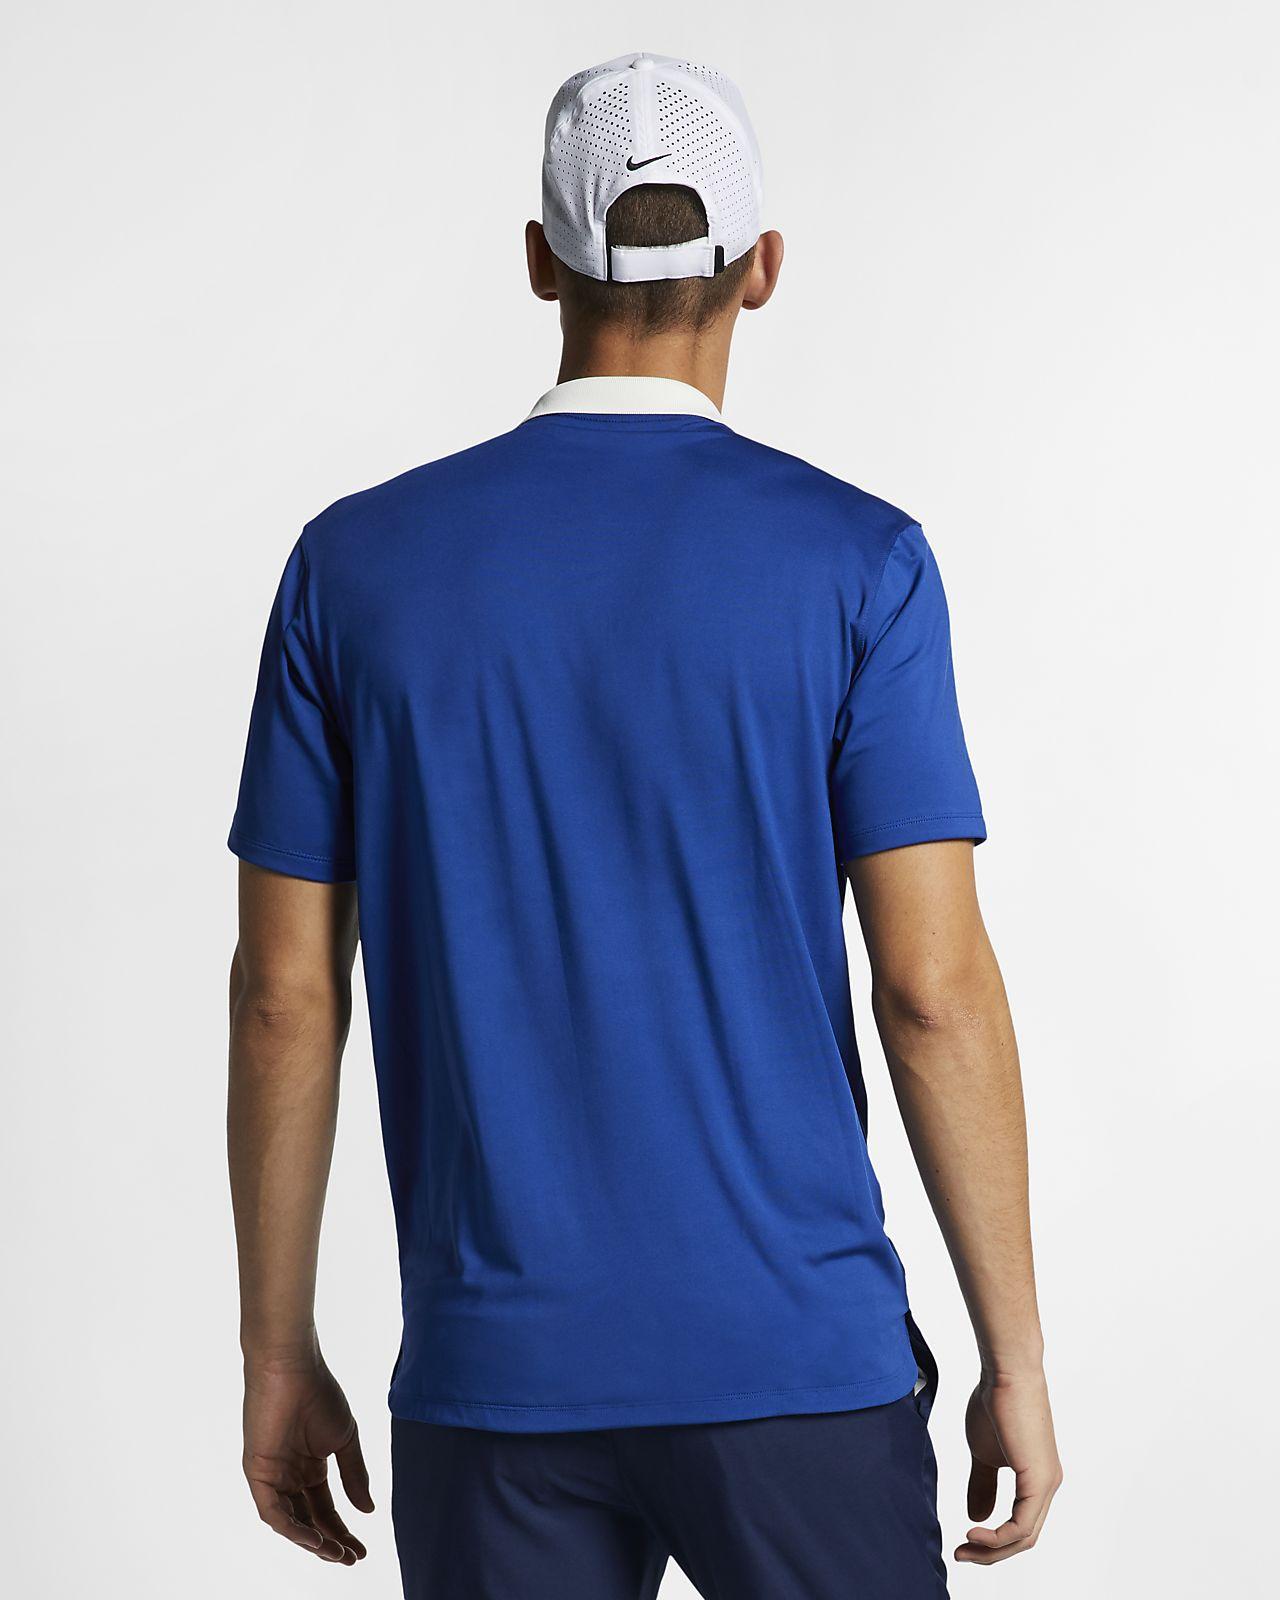 8e445375 Nike Dri-FIT Vapor Men's Golf Polo. Nike.com GB